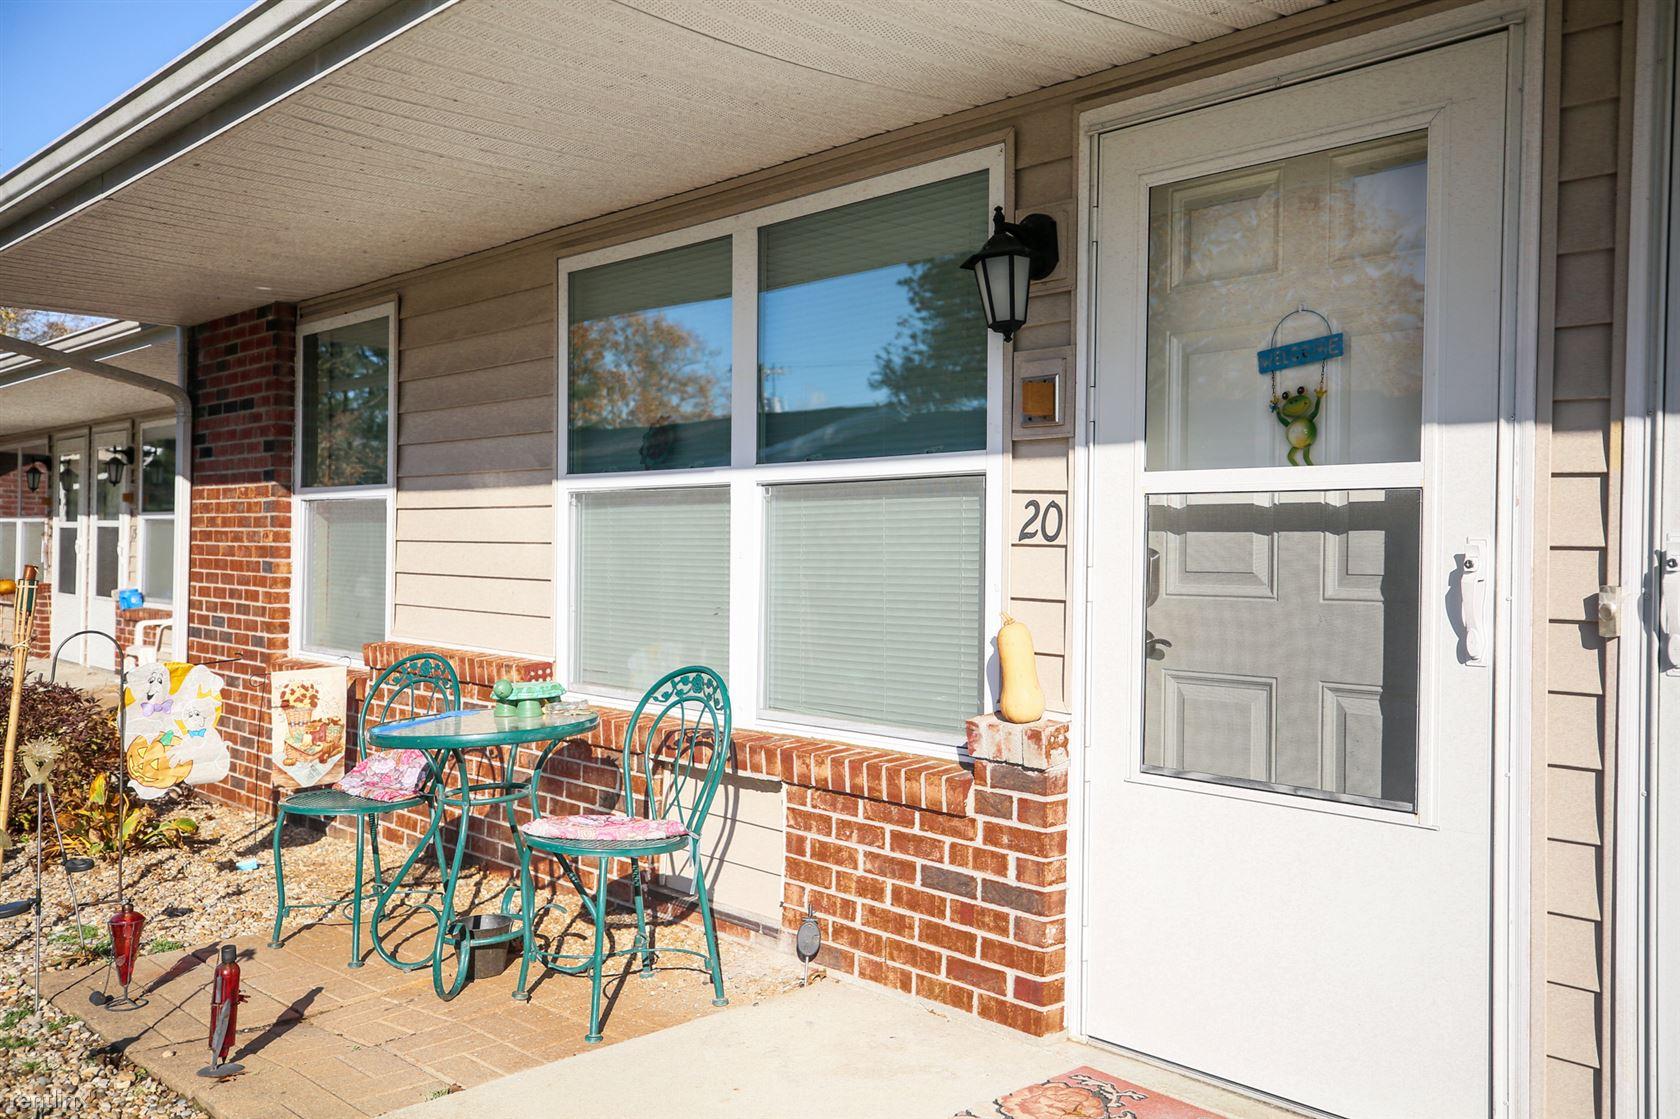 240 West St., Worthington, IN - $397